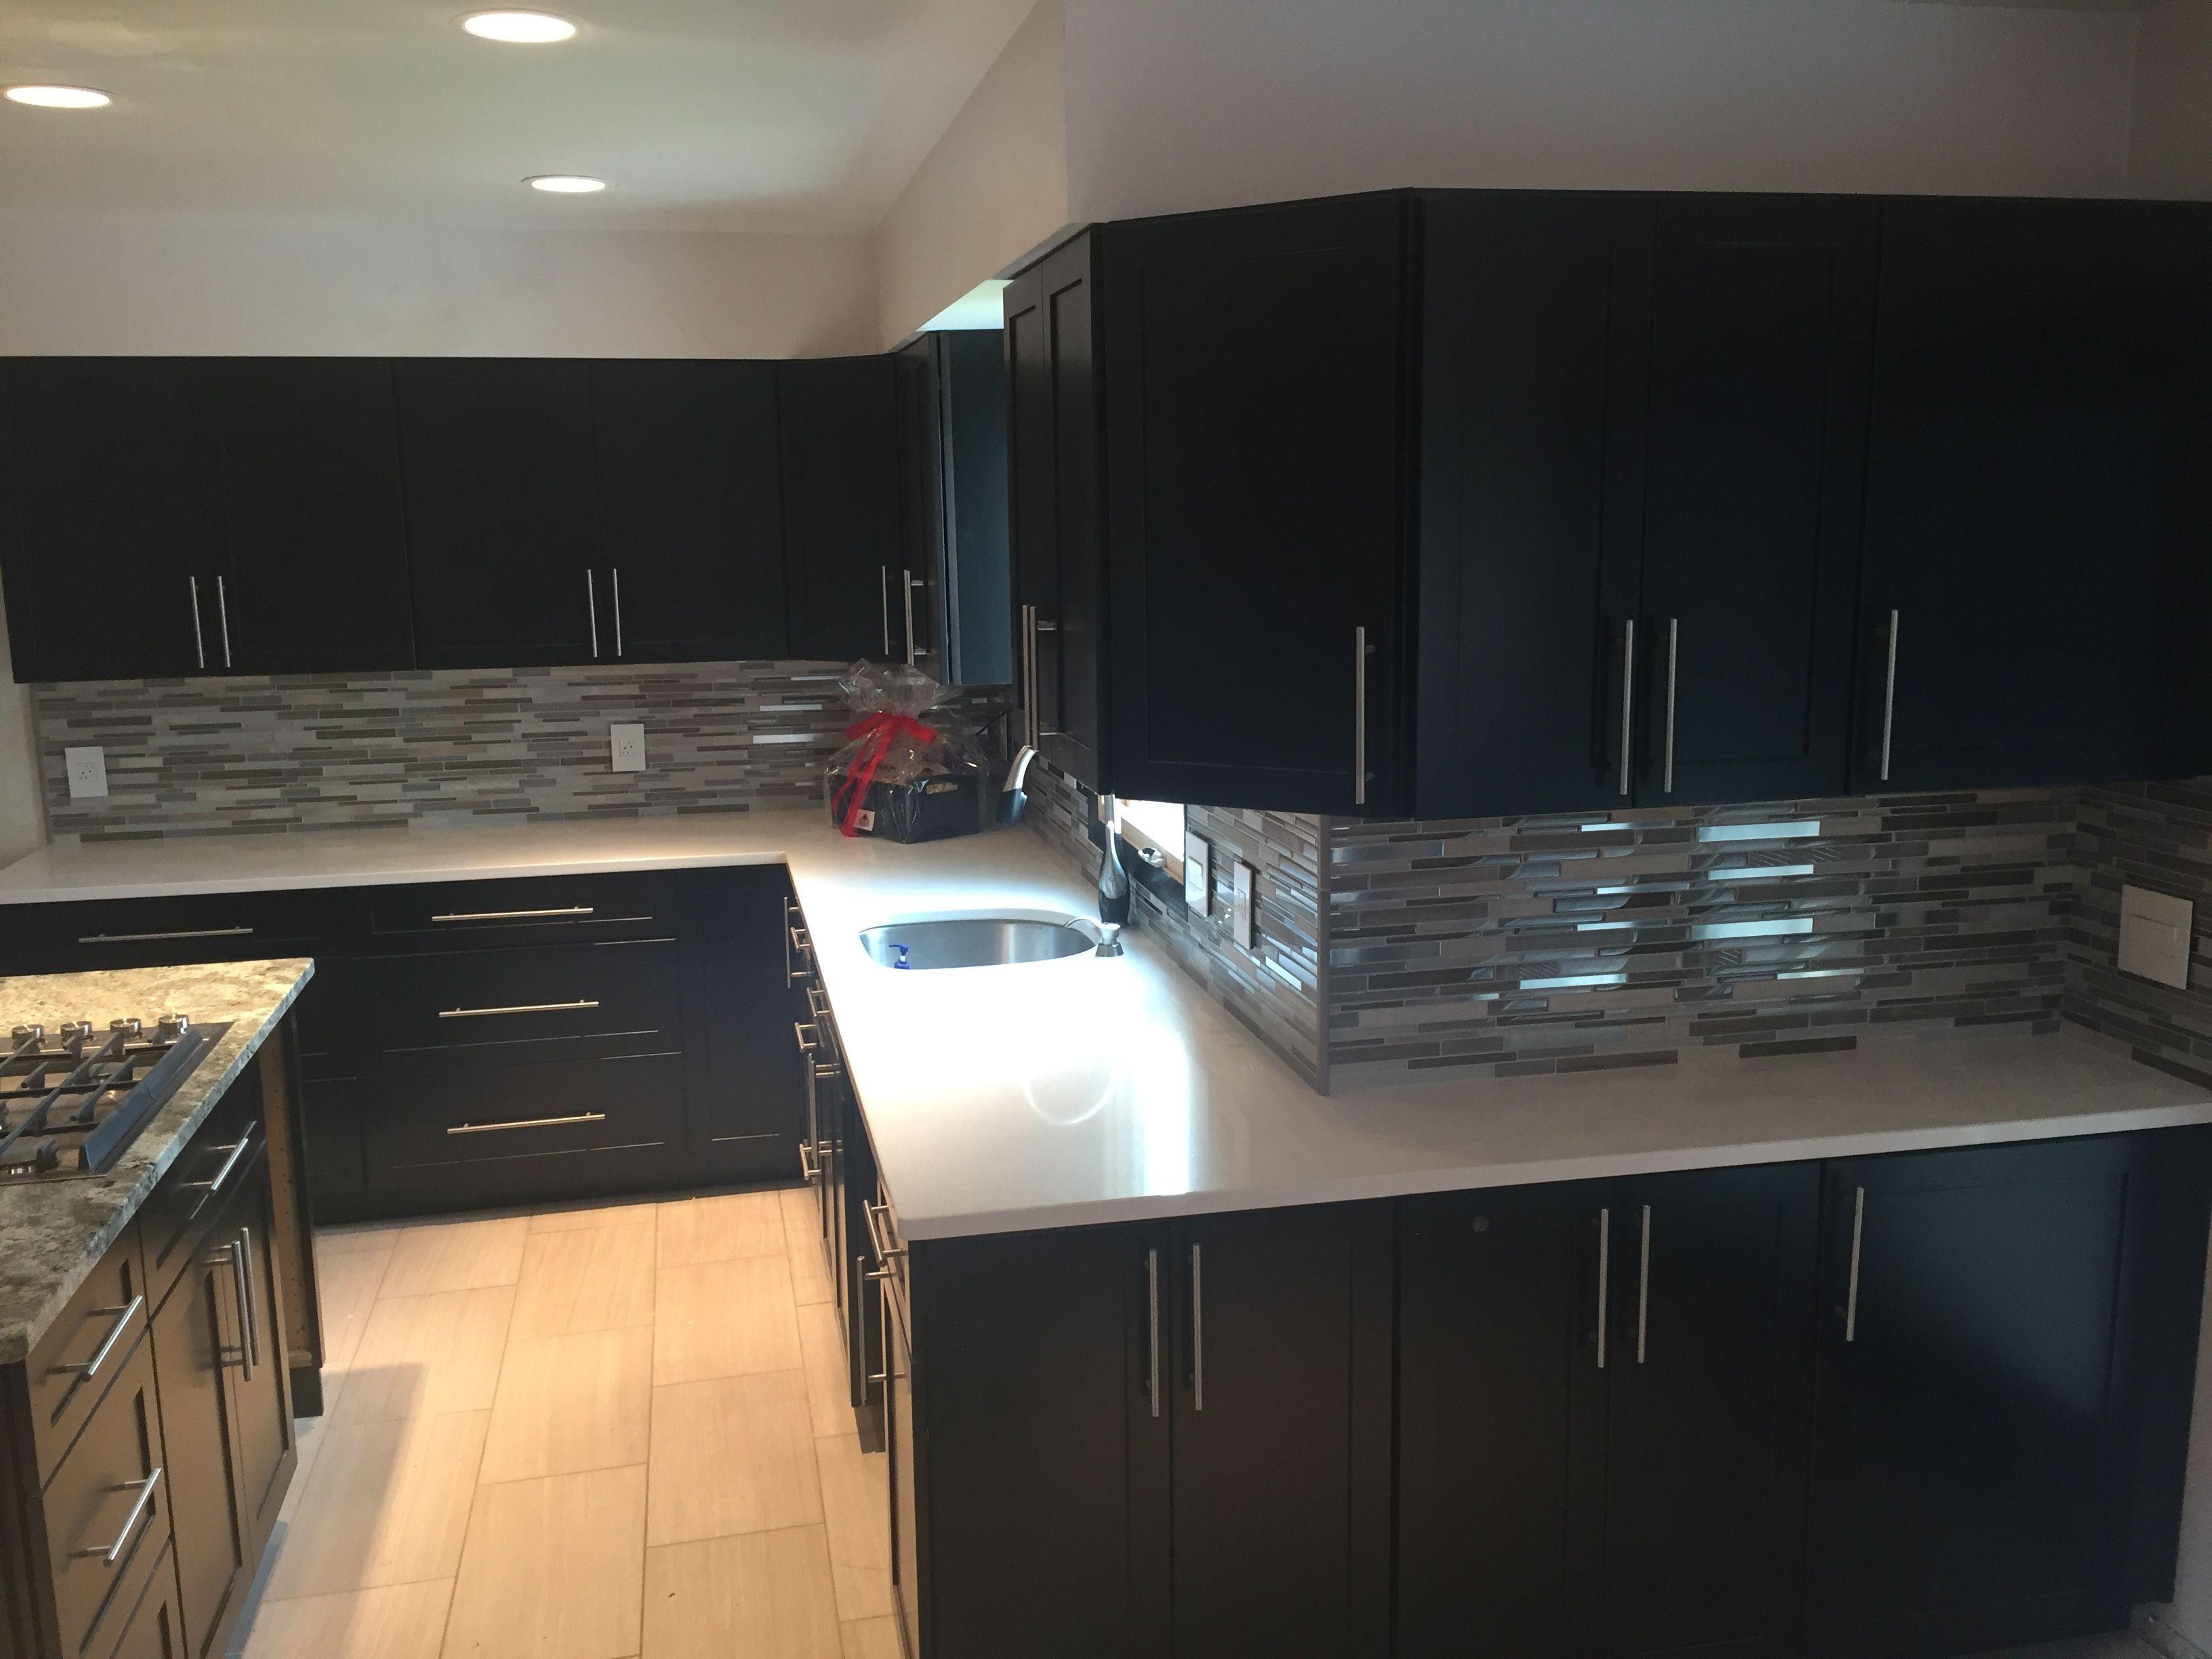 Best Kitchen Gallery: We Installed Ebony Kitchen Cabi S With Glass Mosaic Tile of Ebony Kitchen Cabinets on rachelxblog.com